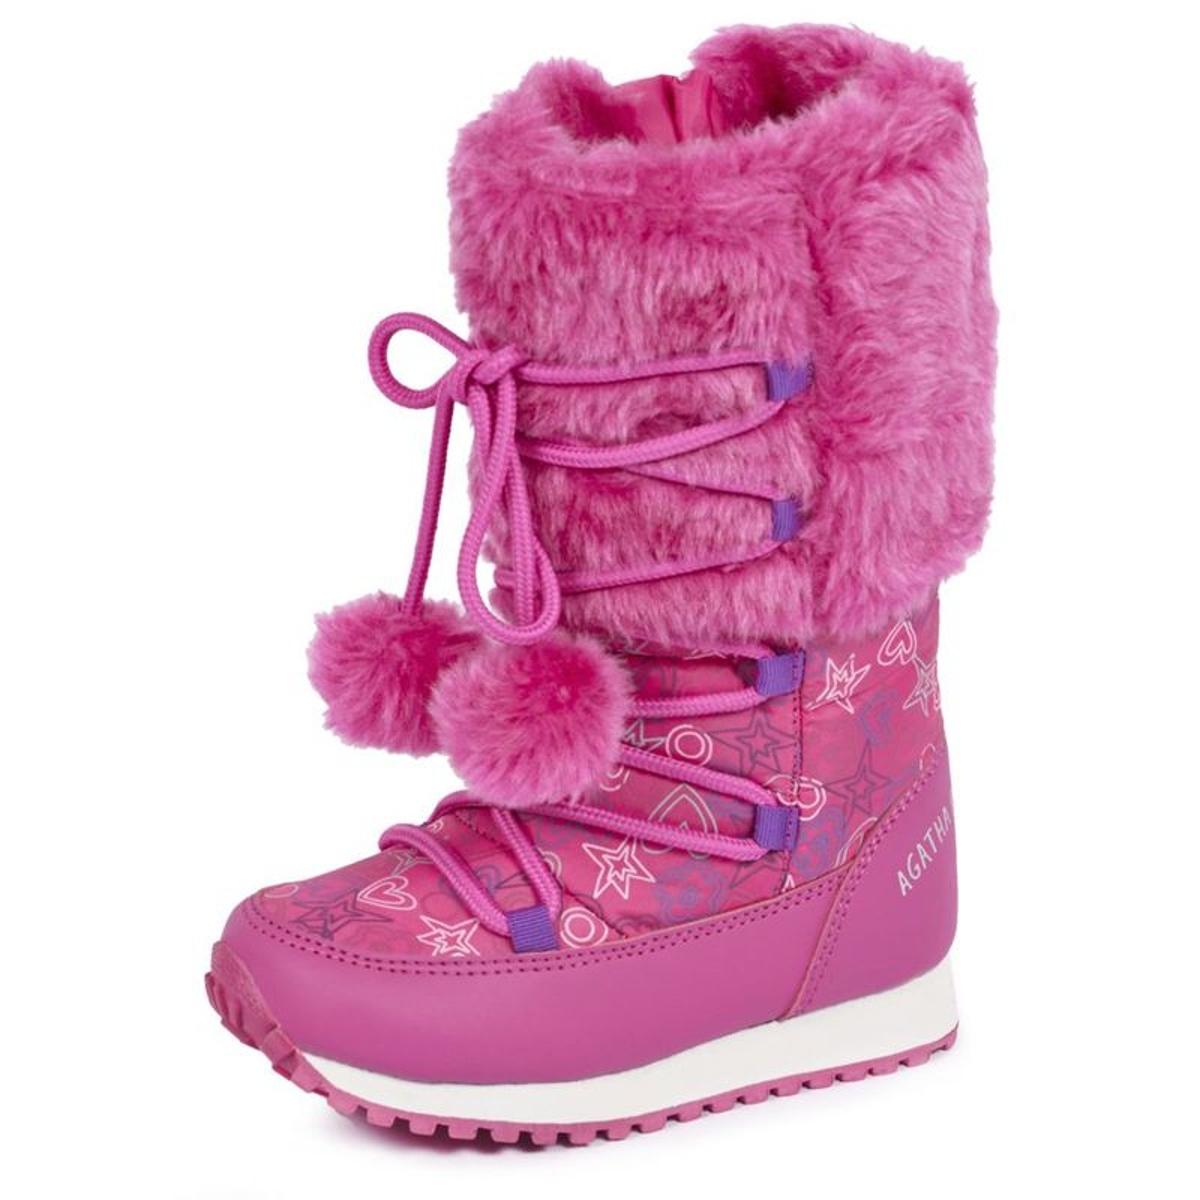 Agatha Ruiz de la Prada Après-ski  Fille rose 161996B